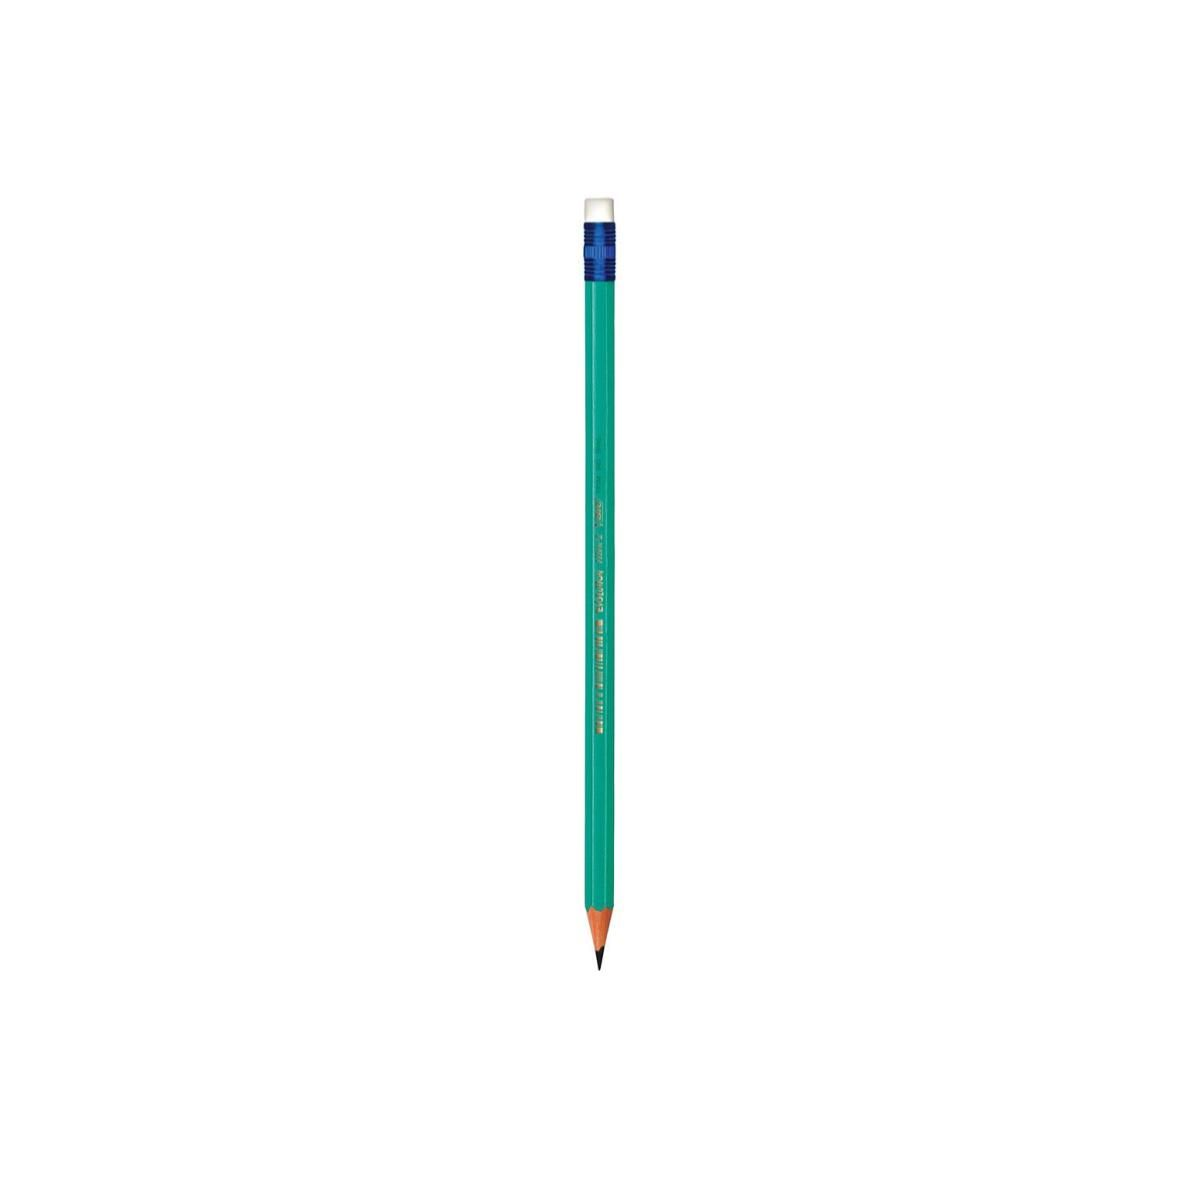 Lápis Preto Hexagonal Com Borracha N.2 Bic